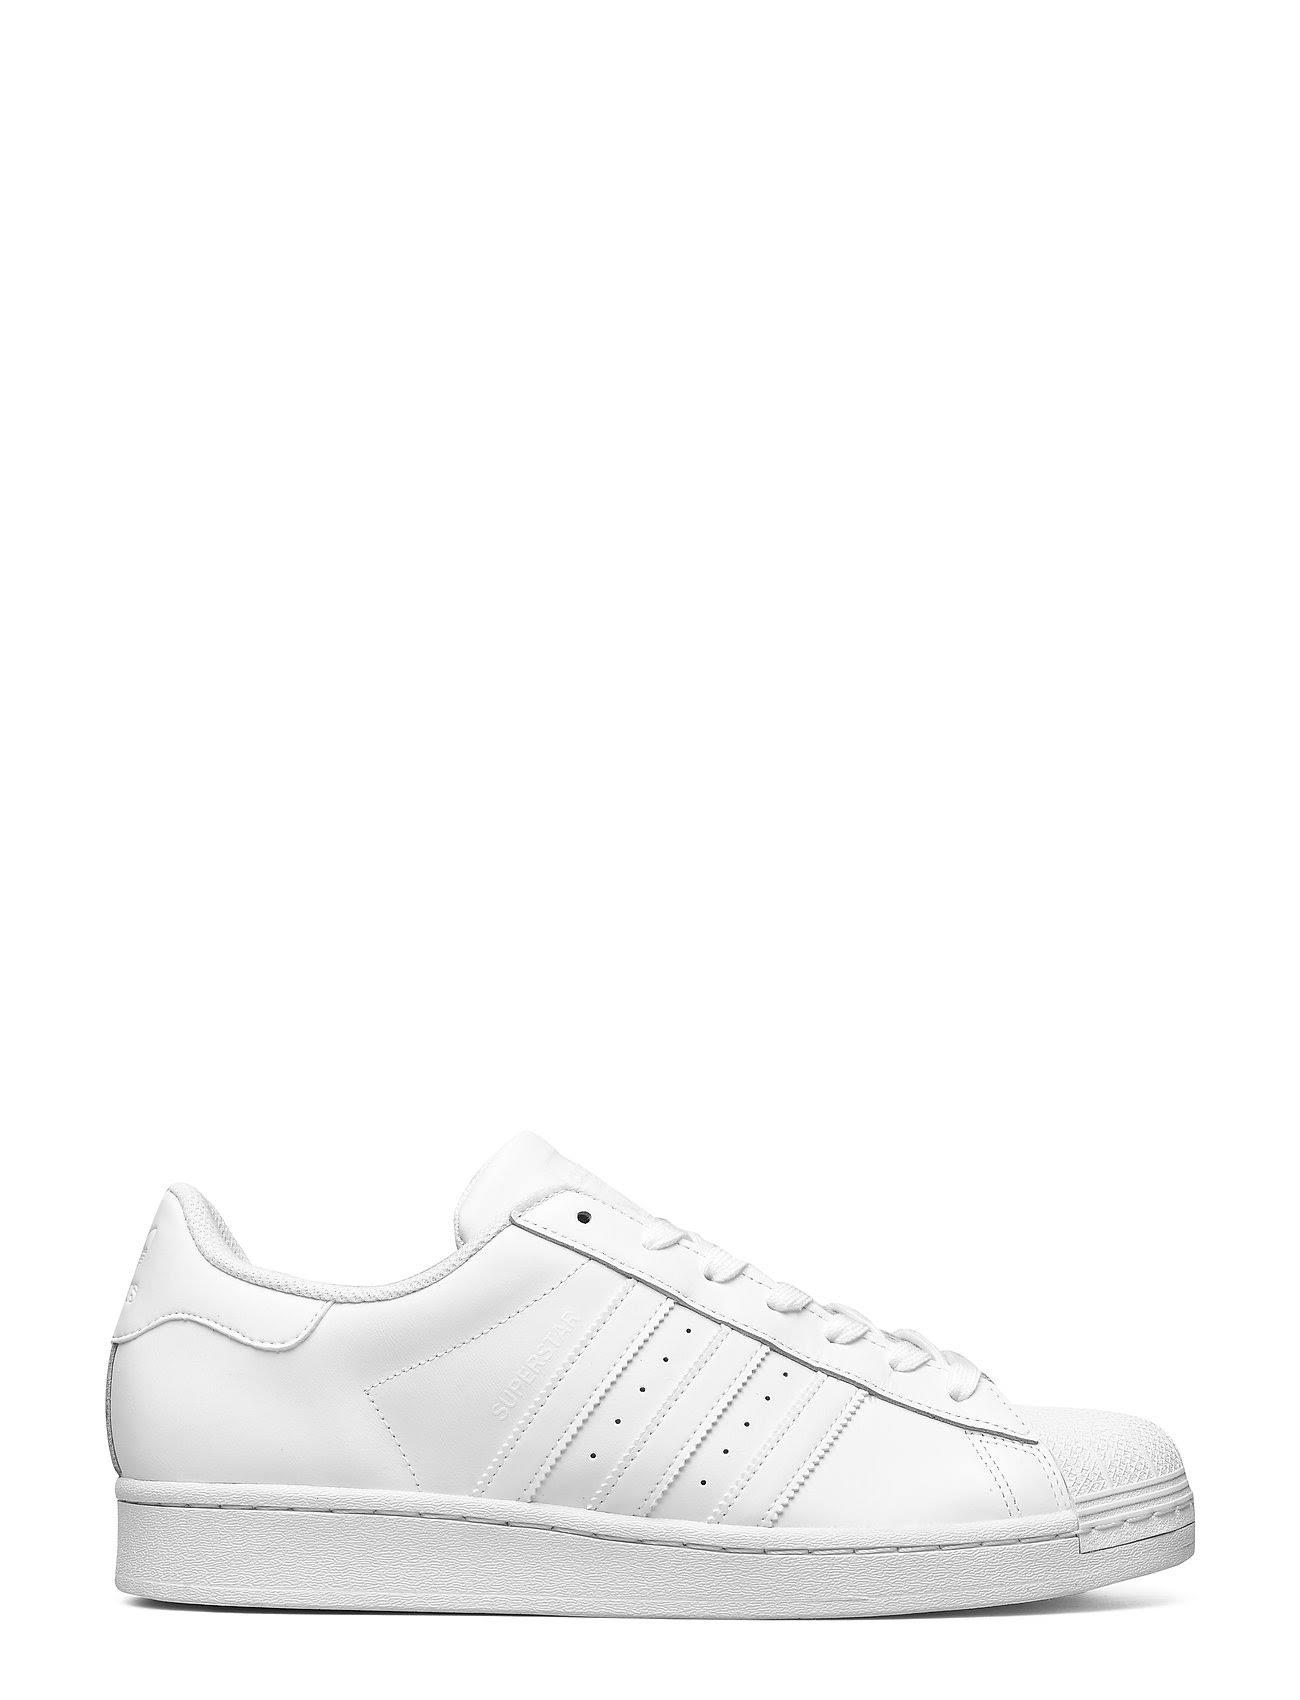 Adidas Originals Superstar, White